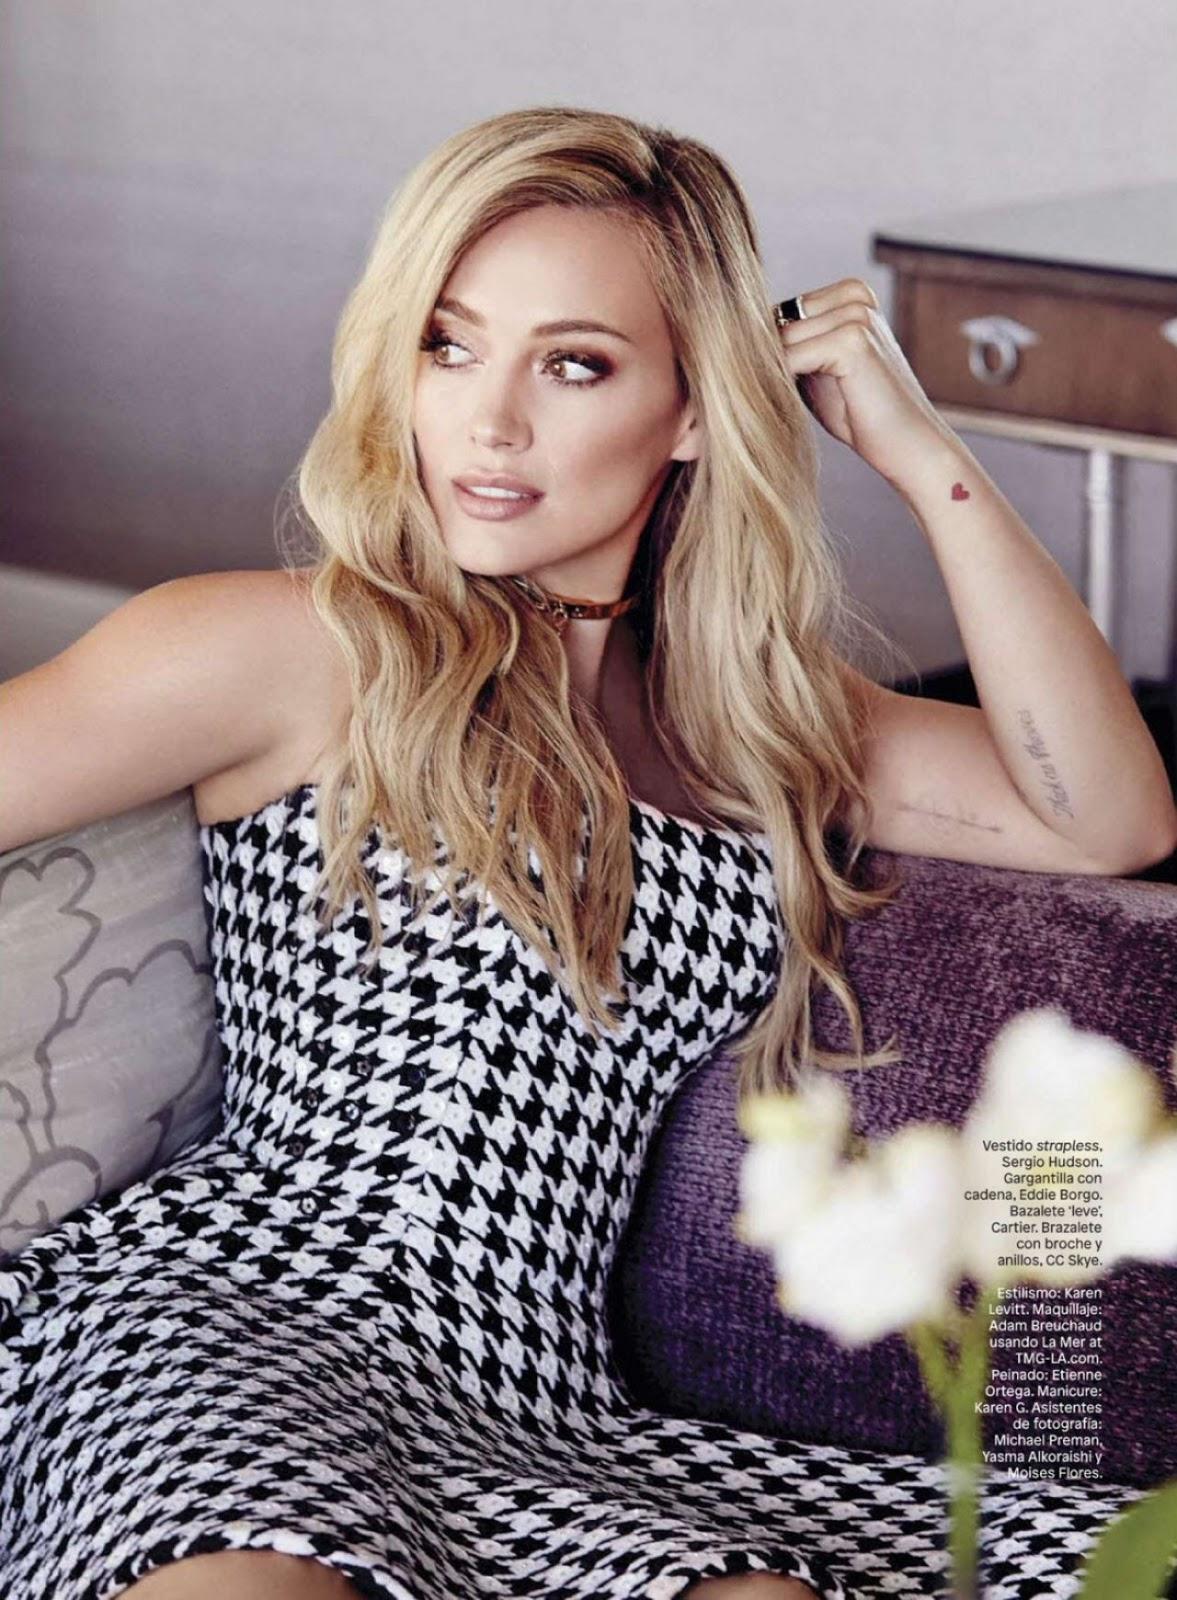 Arts Cross Stitch: Actress, Singer @ Hilary Duff - Glamour ... Hilary Duff